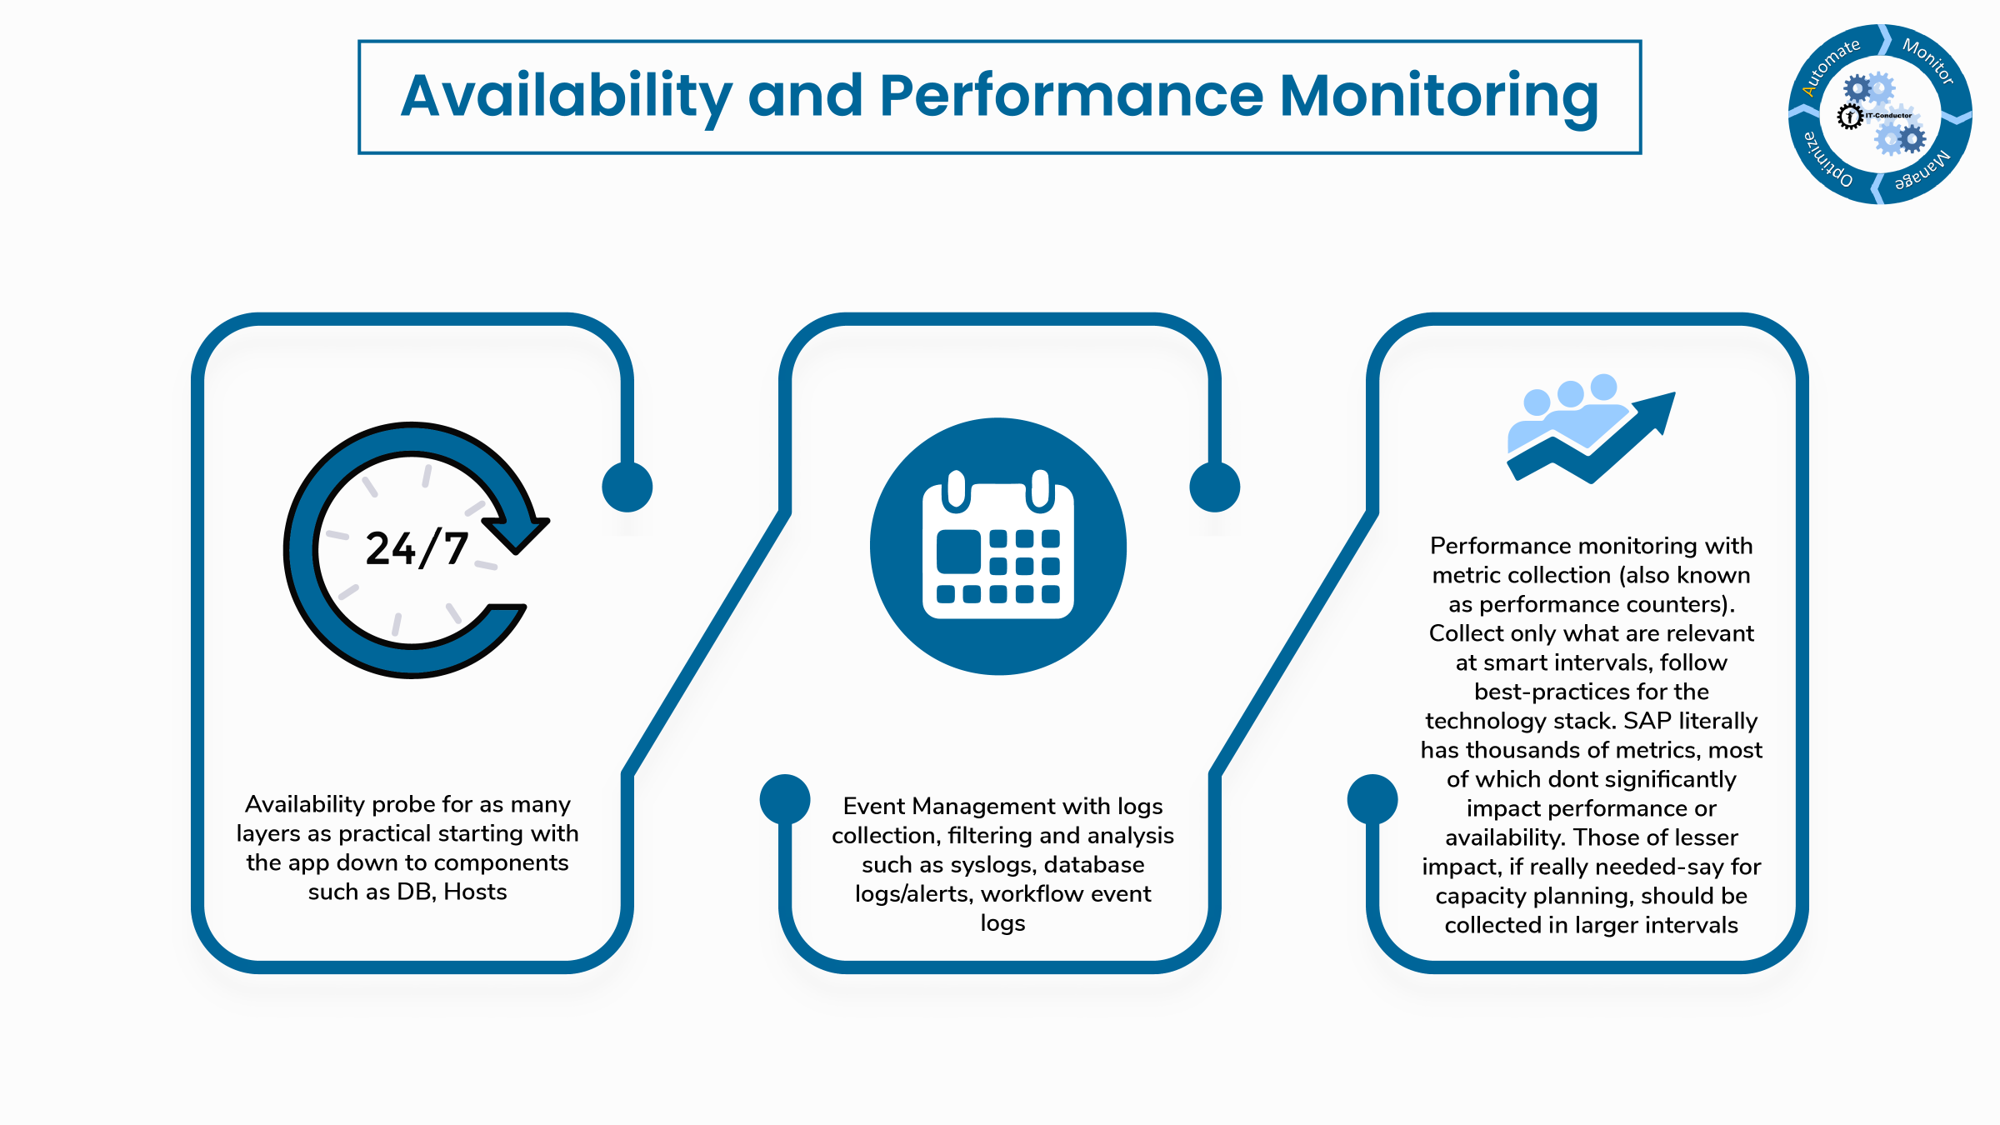 cc72d93a ozsoft itc availabilityandperformancemonitoring